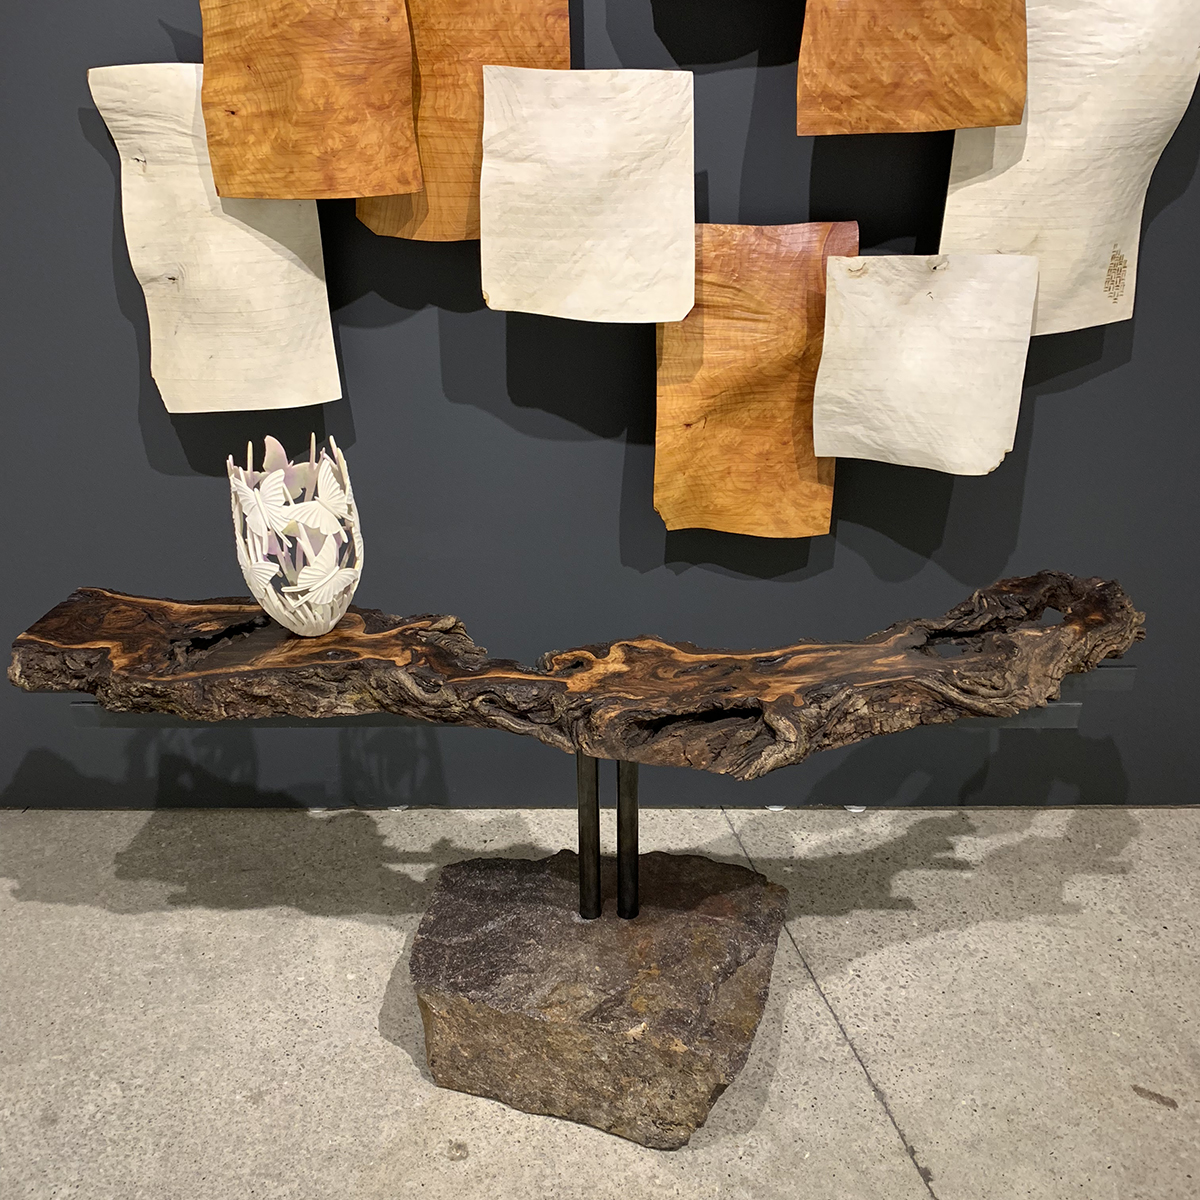 sofa 2018 boulder #1.jpg